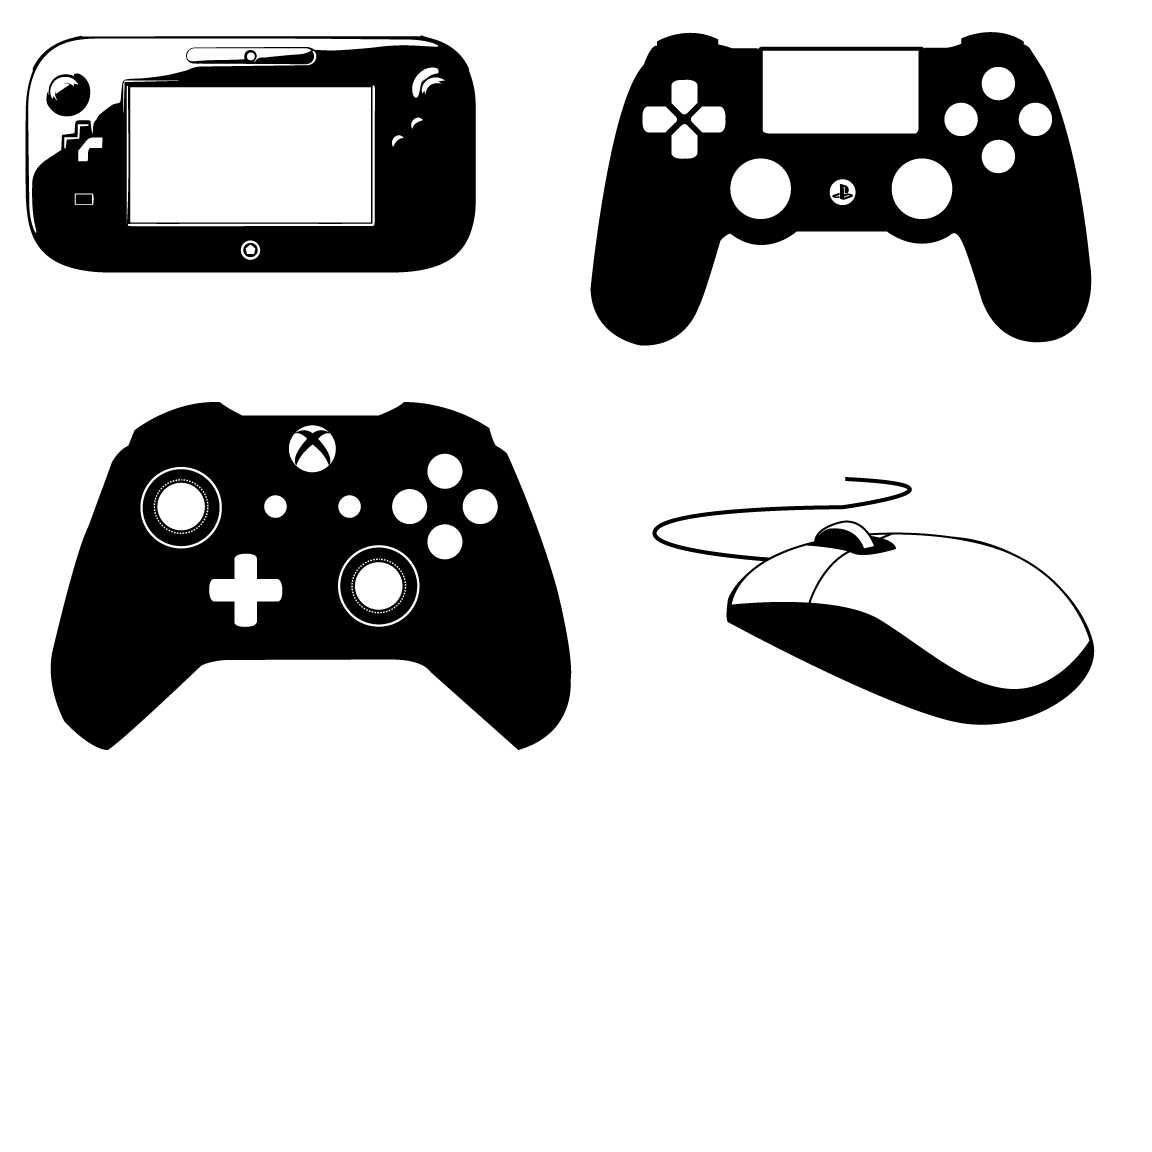 16 Controller Icon Vector Images - Game Controller Icon ...